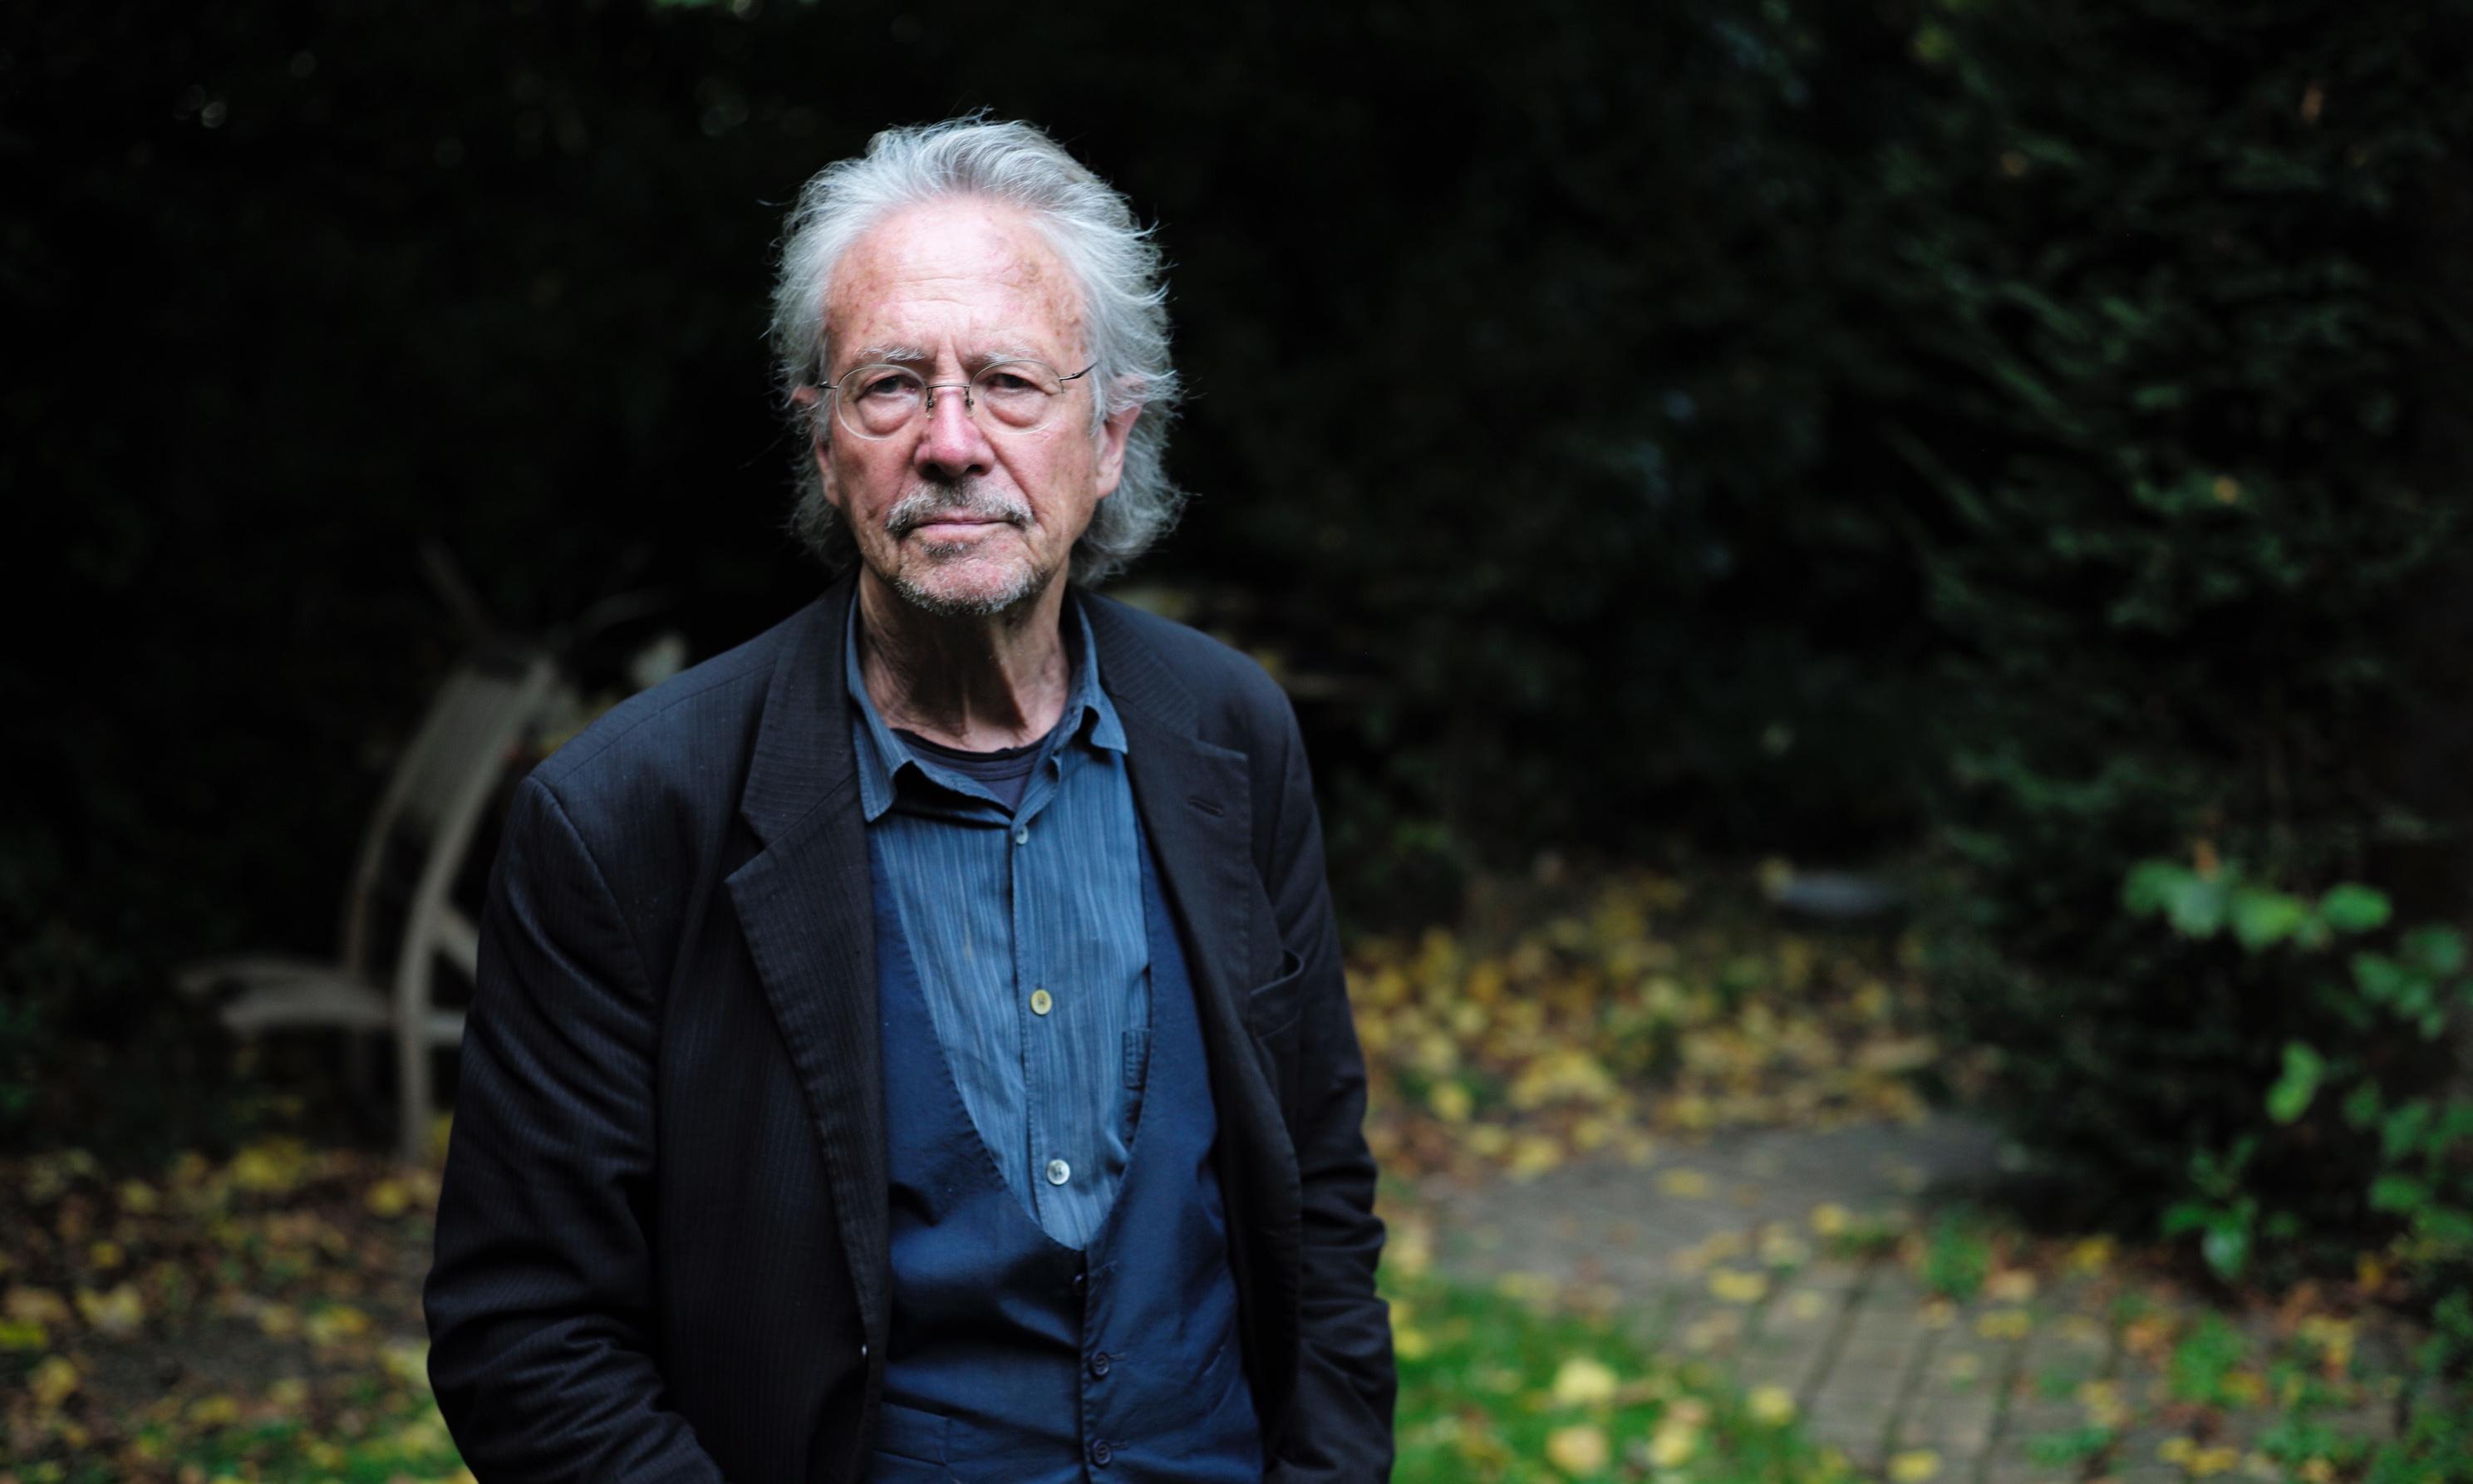 Peter Handke: an adversarial talent and controversial Nobel laureate